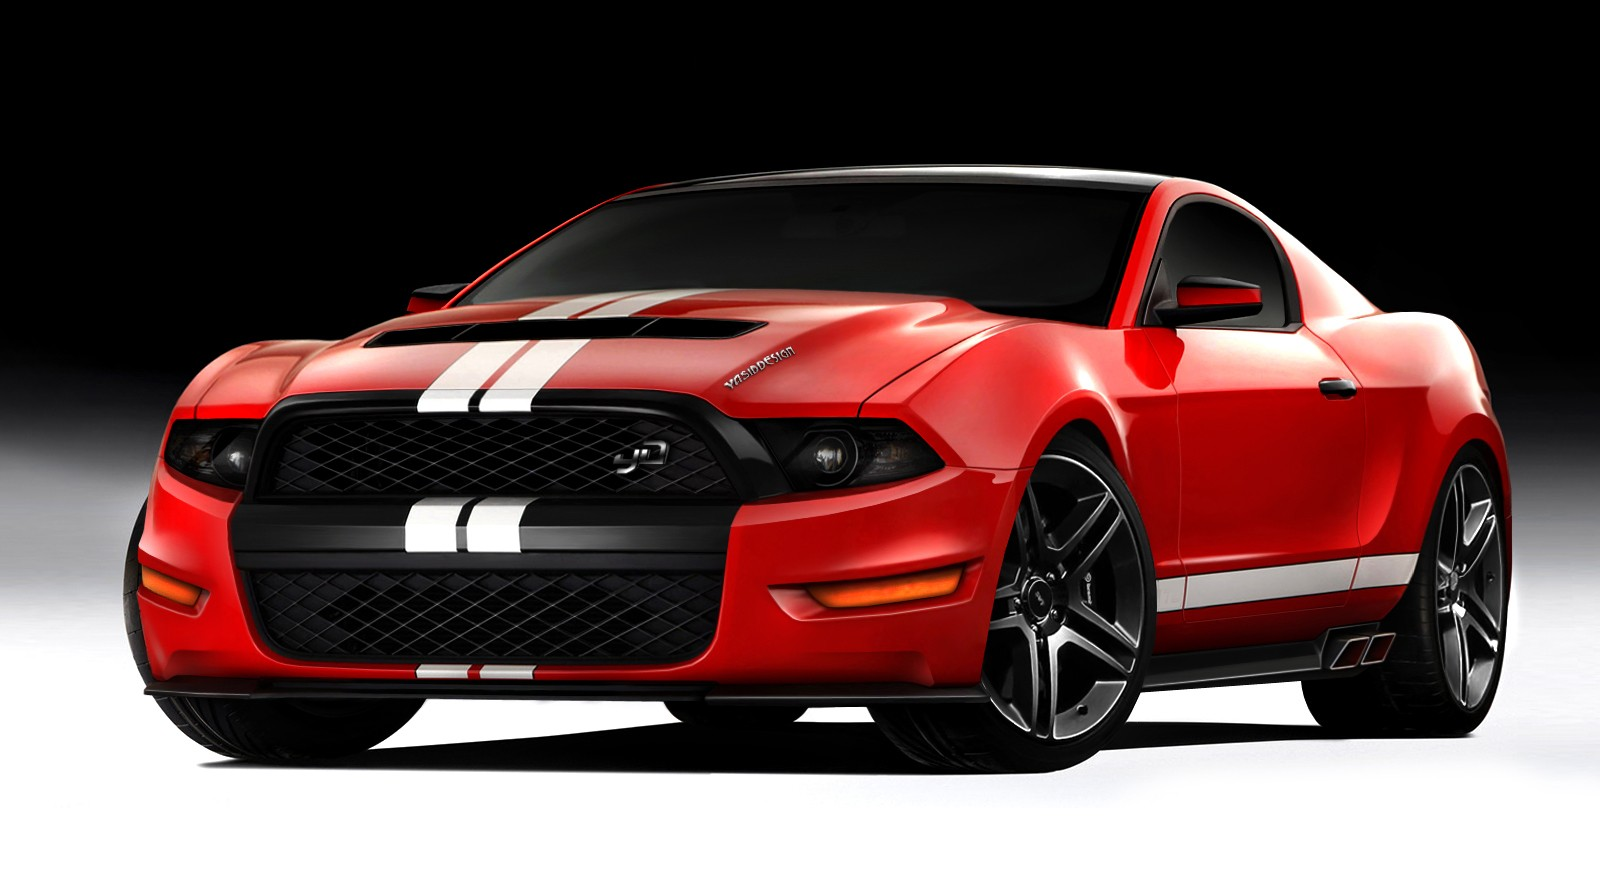 2014 Ford Mustang GT HD Wallpaper HD Wallpaper of 1600x892